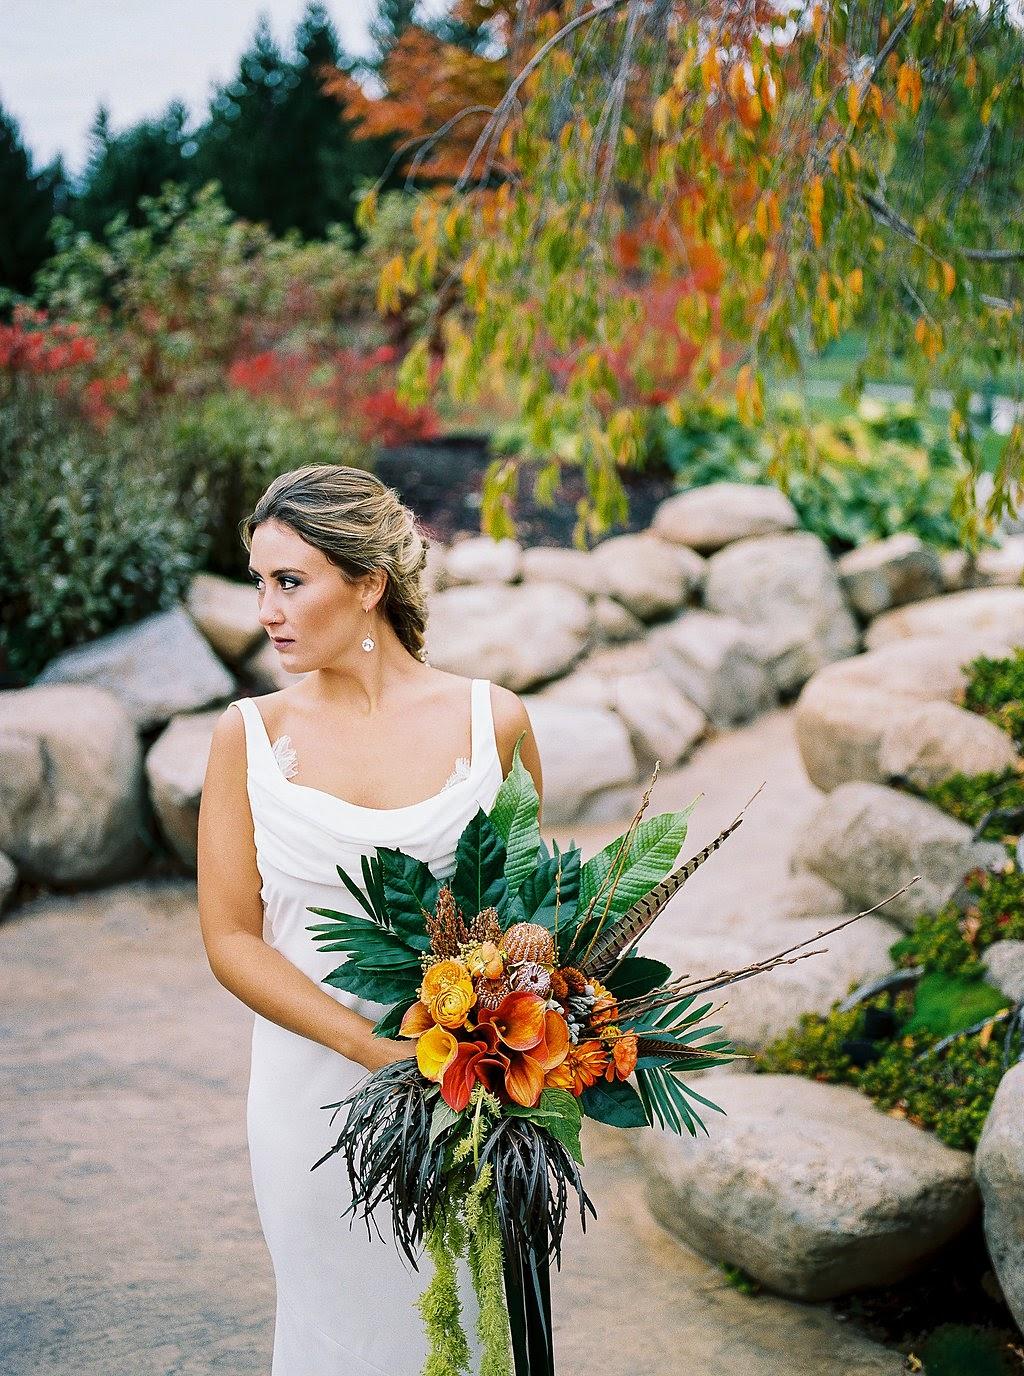 Alexandra-Elise-Photography-Ali-Reed-Film-Wedding-Photographer-Deerfield-Country-Club-108.jpg